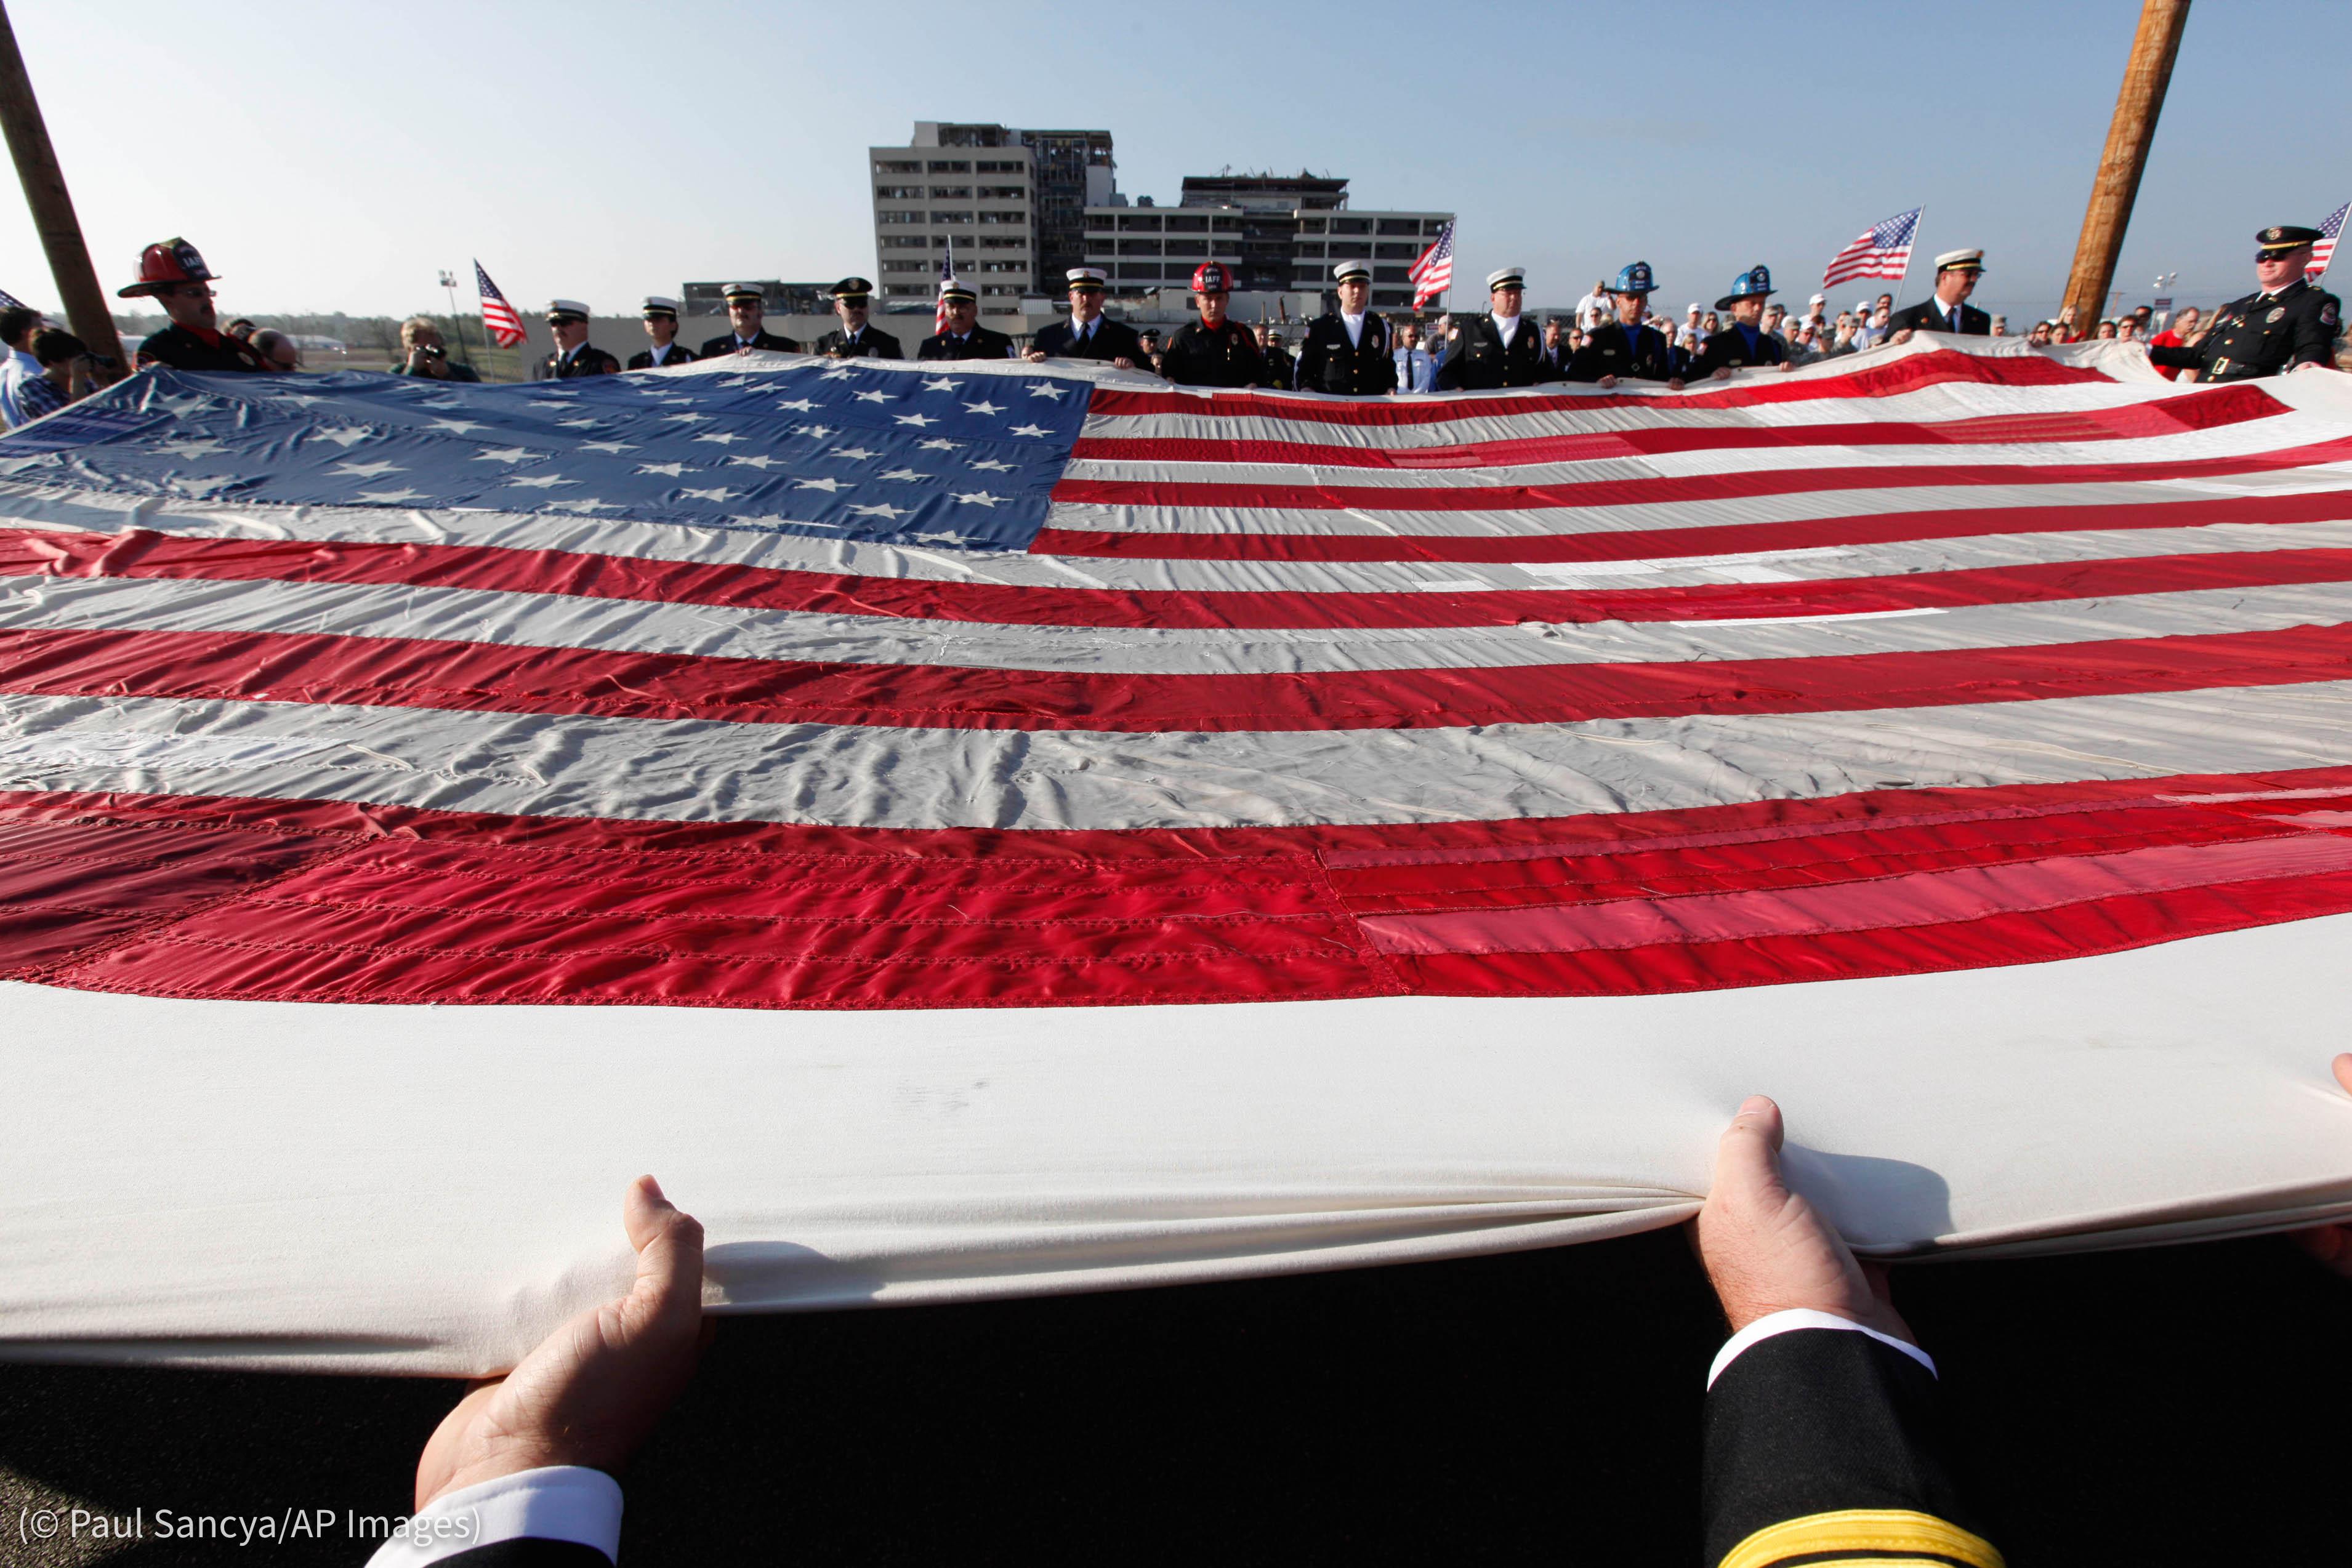 People in various uniforms holding large American flag (© Paul Sancya/AP Images)